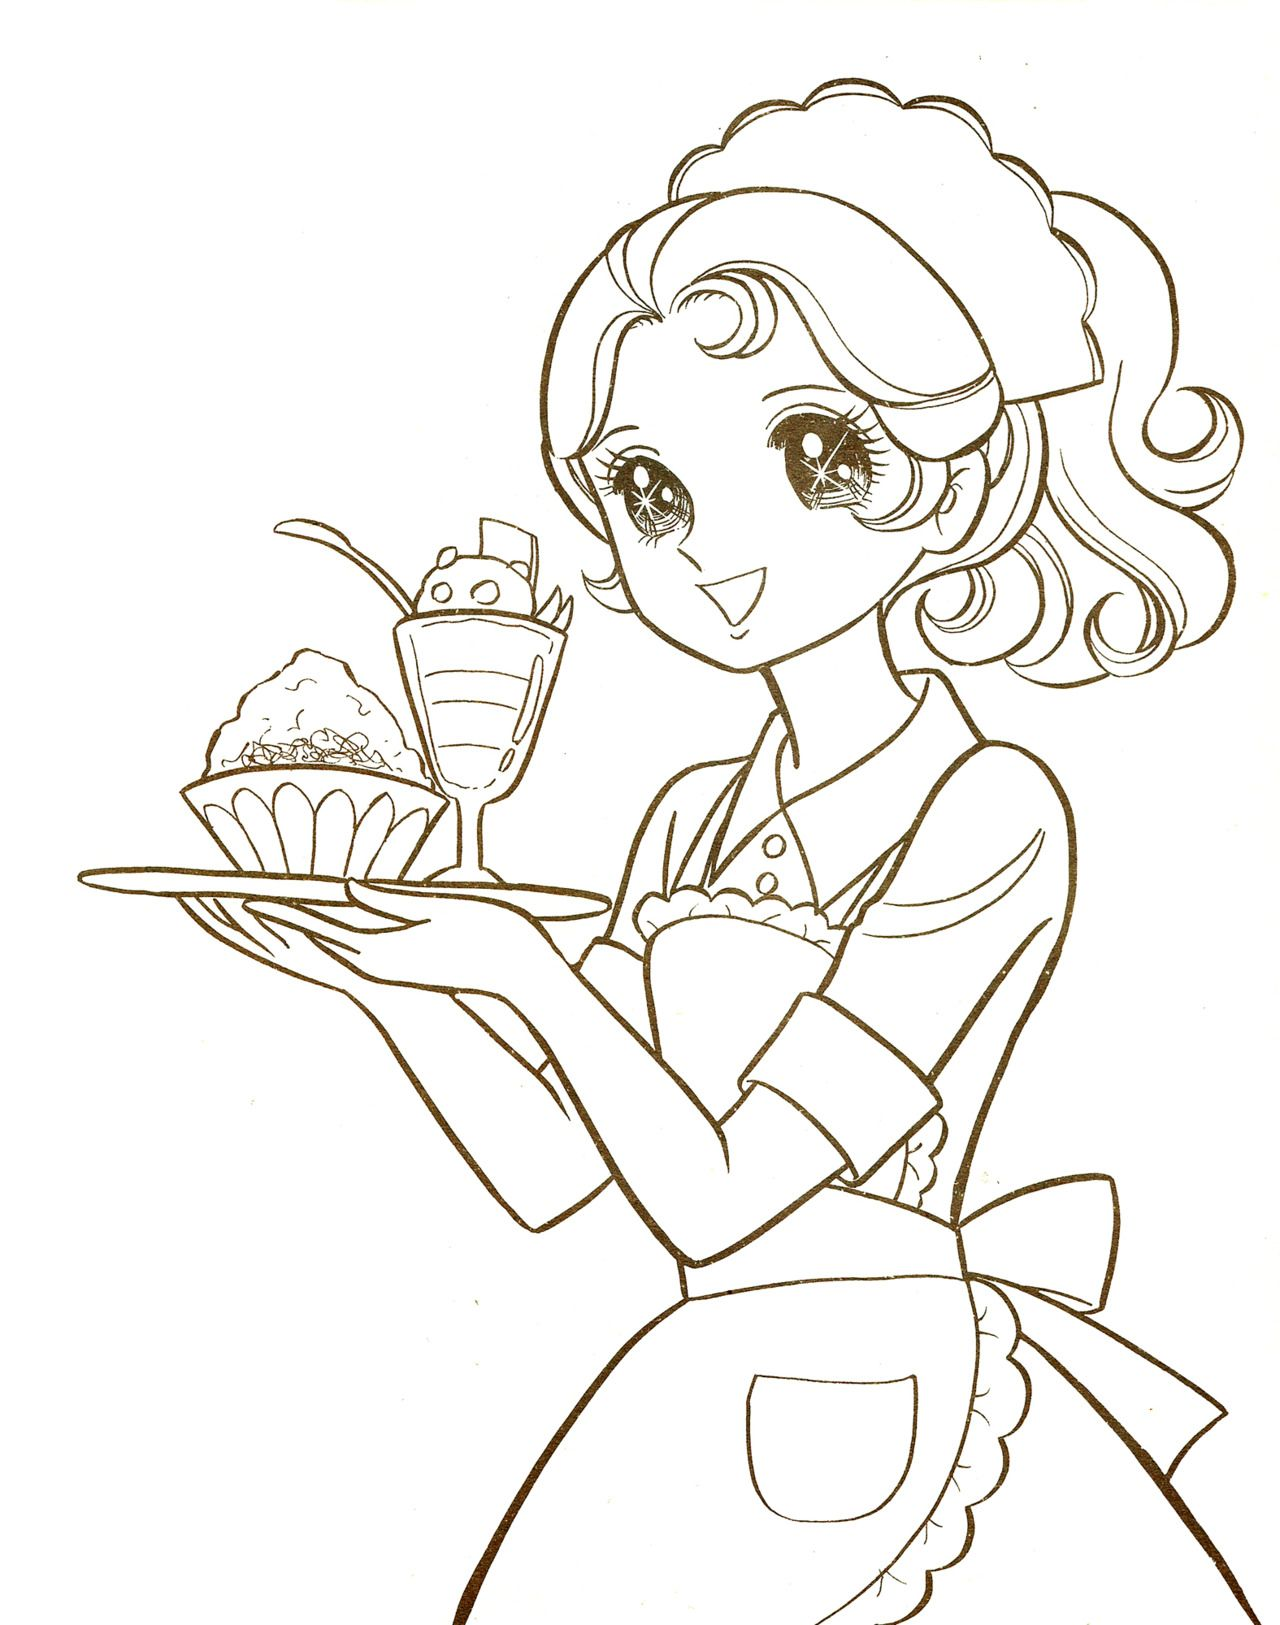 Ausmalbilder Manga Mädchen : Vintage Shoujo Manga Buscar Con Google Anime Pinterest